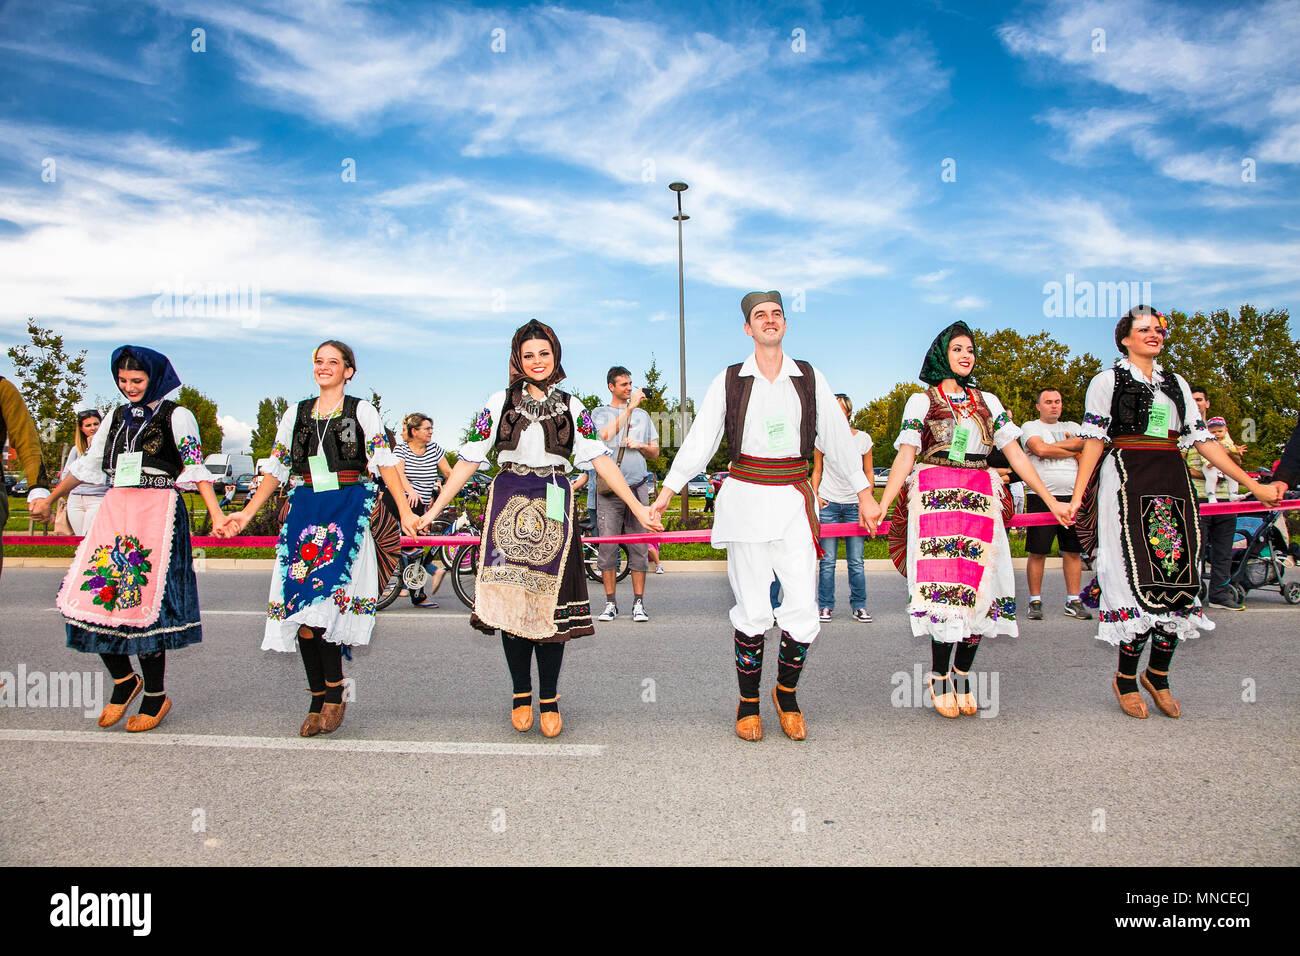 NOVI SAD, SERBIA-OCT 4, 2015: Guinness World Record Largest Folk Dance on Oct 4. 2015 in Novi Sad, Serbia. Over 12.000 participants break the Guinness Stock Photo